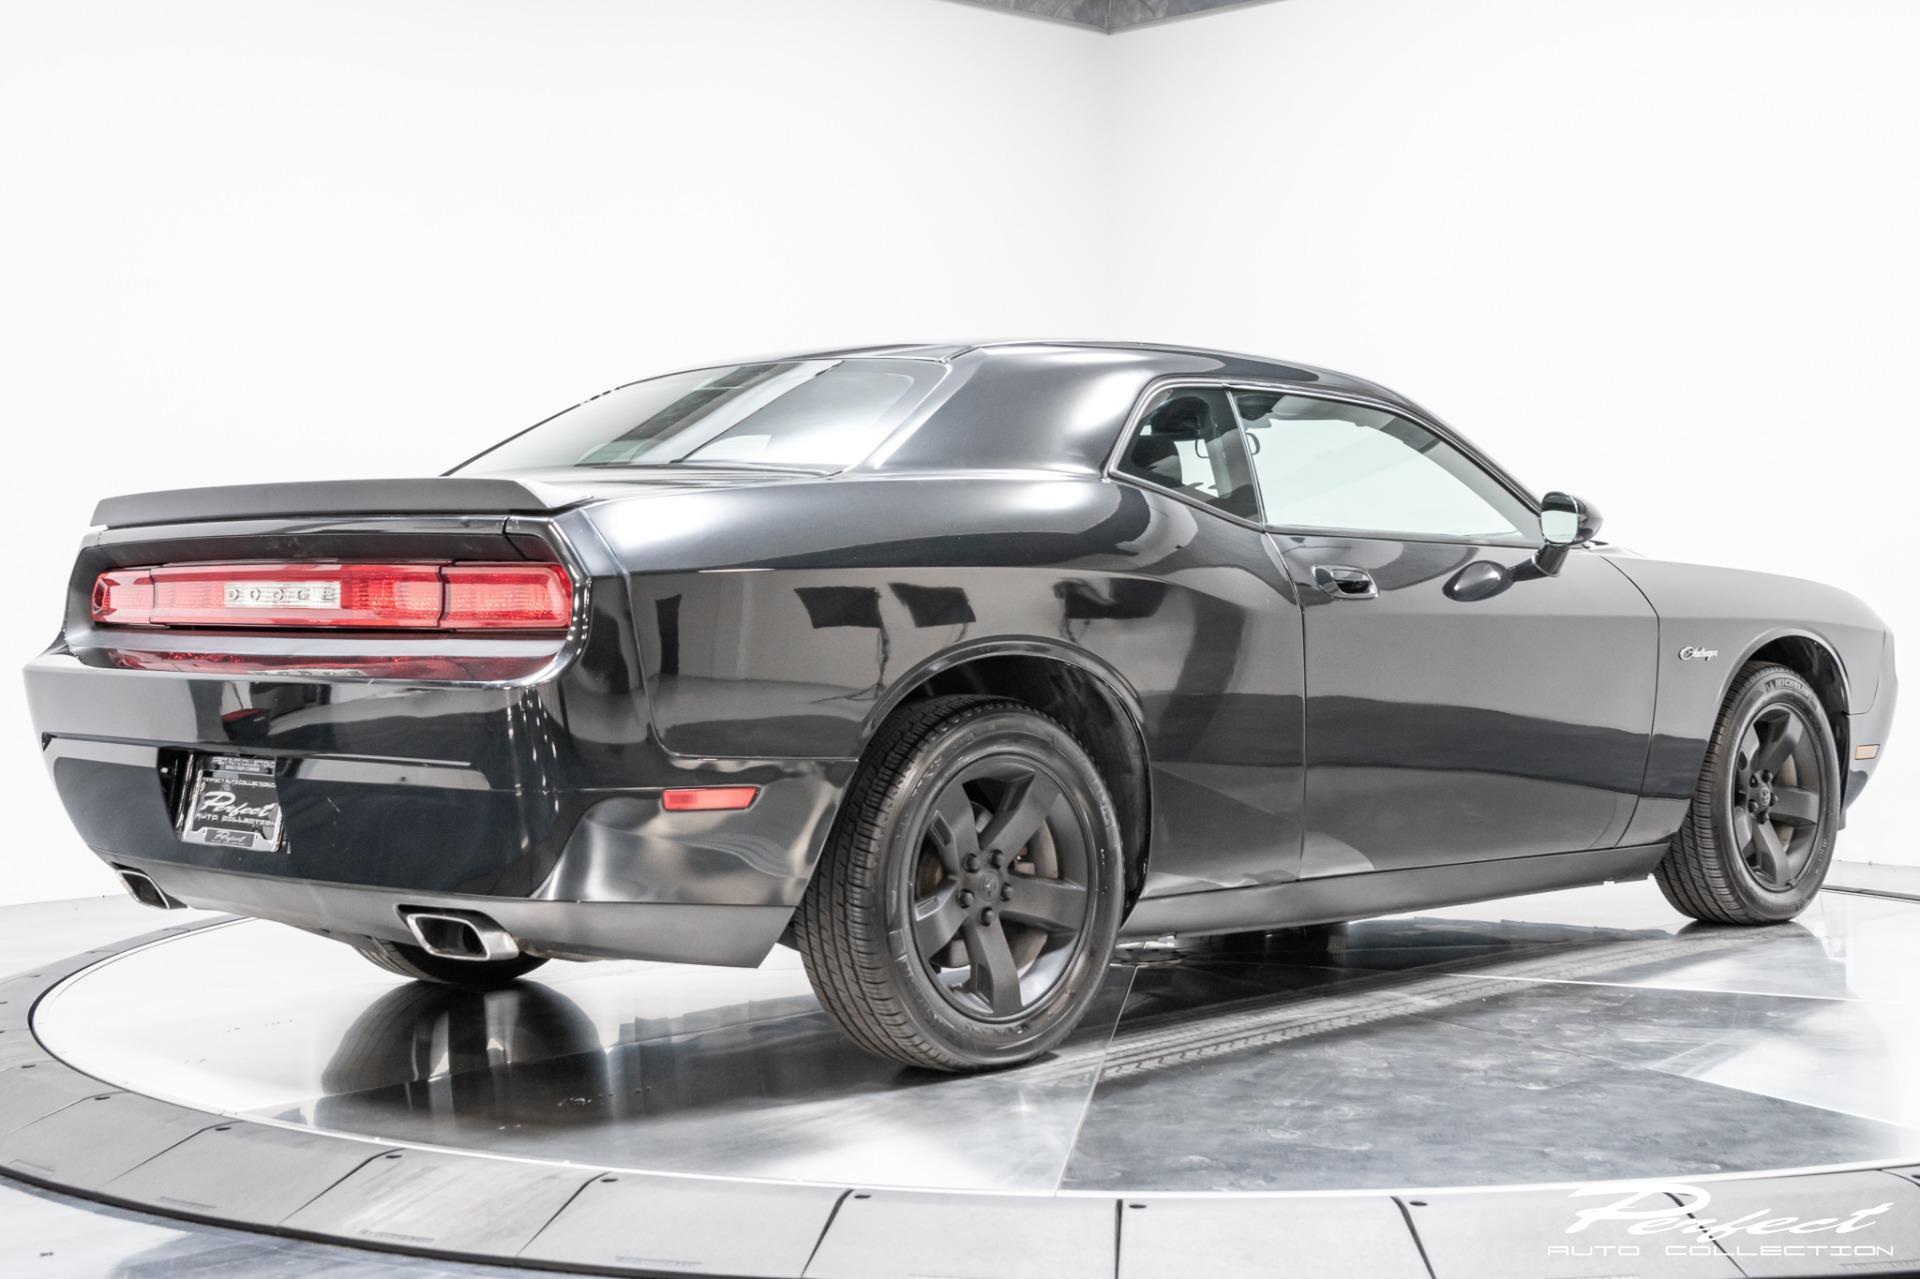 Used 2009 Dodge Challenger RT